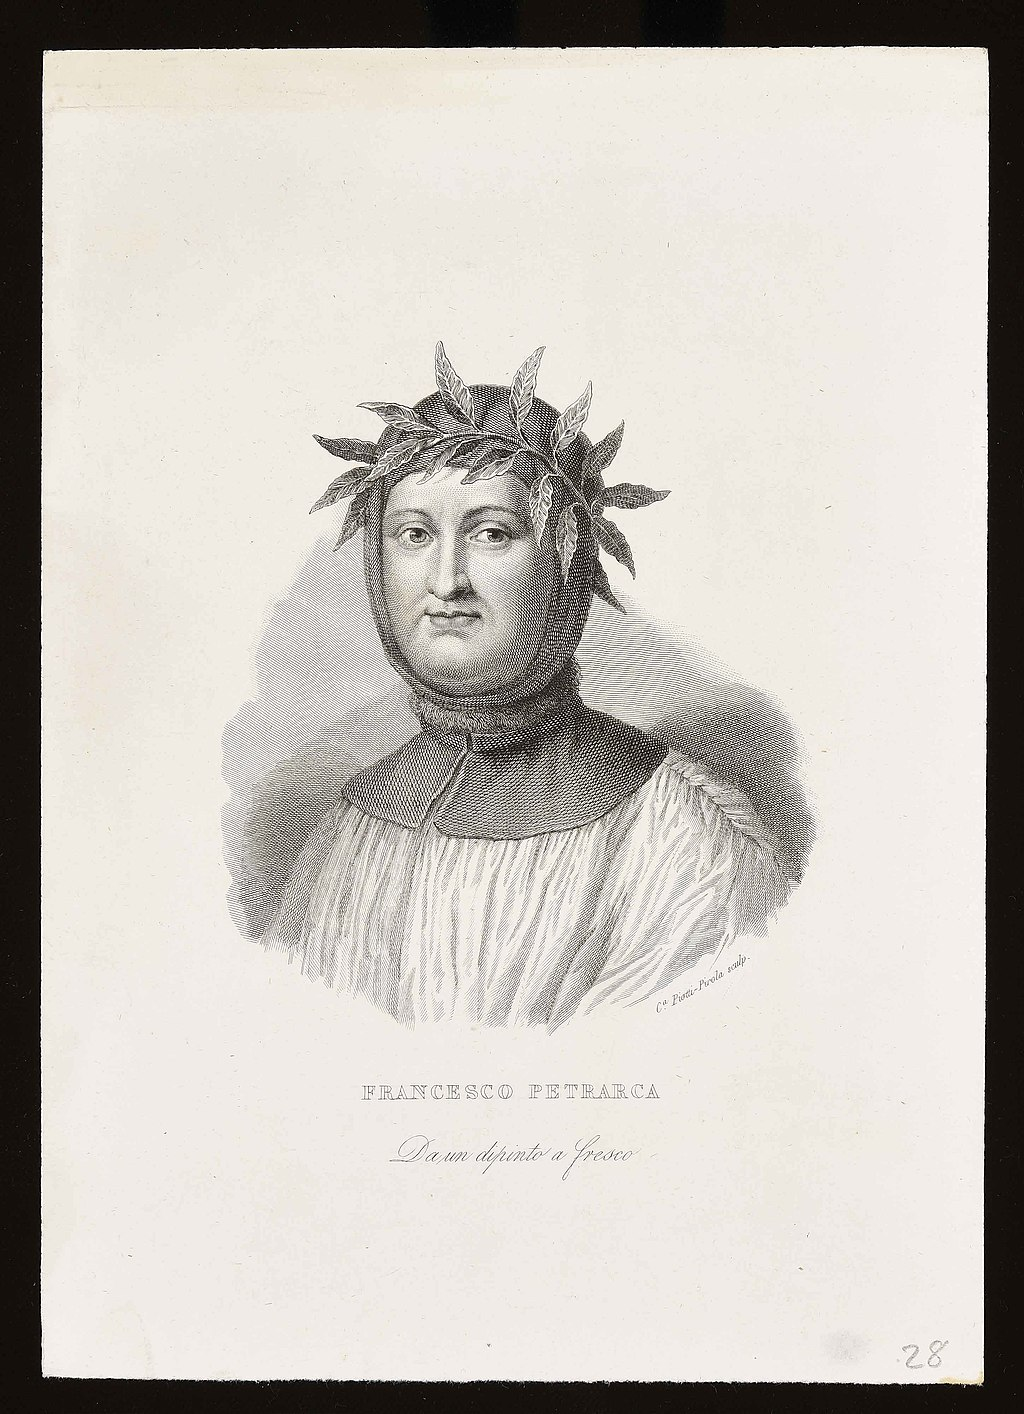 Francesco Petrarca. Caterina Piotti-Pirola sculp